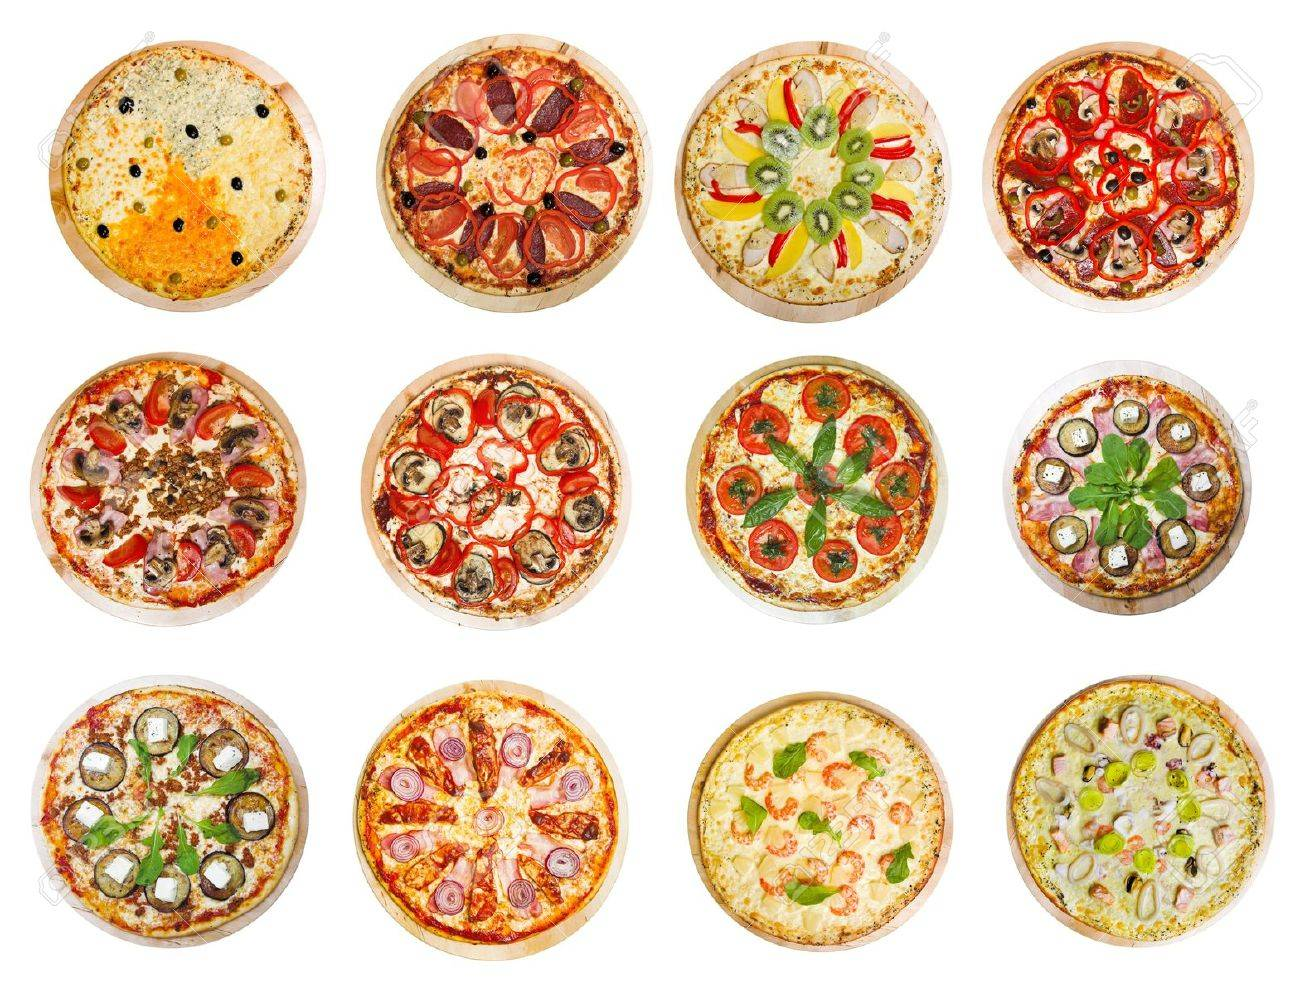 twelve different pizzas put in one set - 12539291